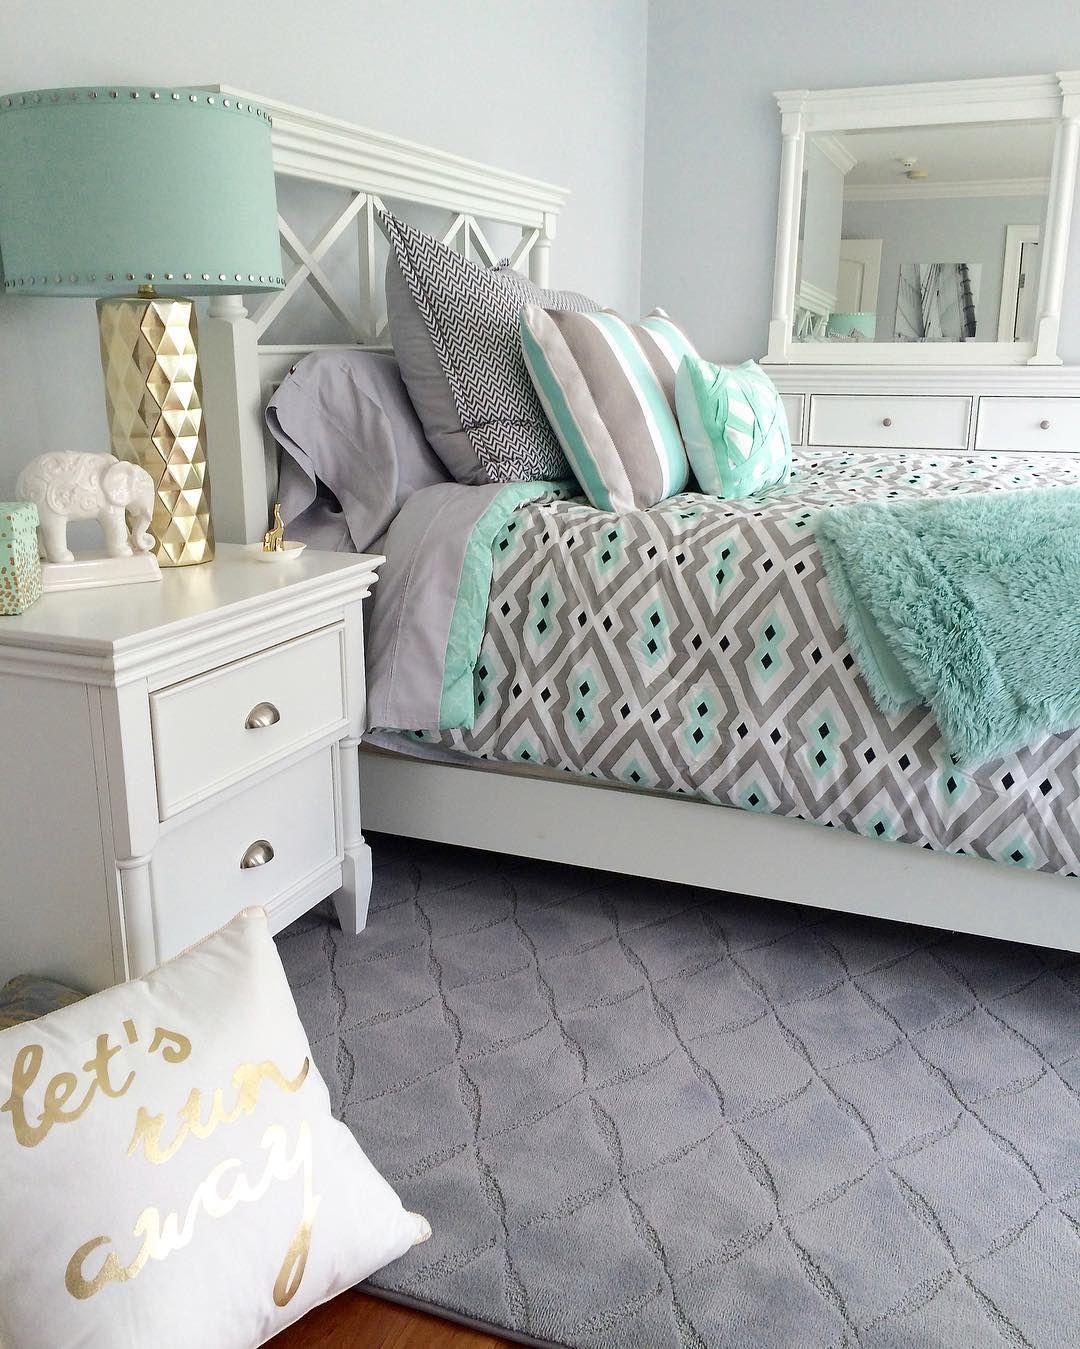 Loft bedroom ideas for teenage girls  Pin by Shannon McCarty on Girls Bedroom  Pinterest  Clean slate